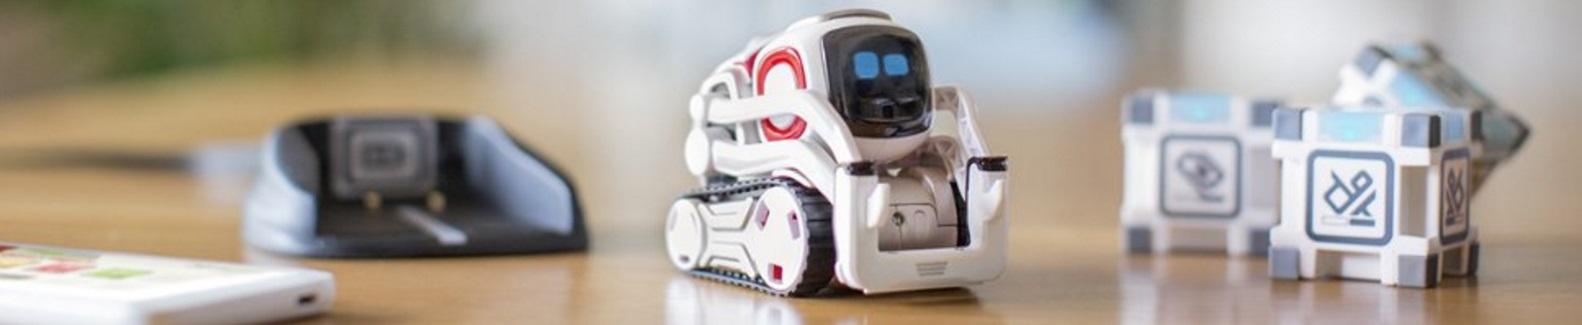 cozmo-2-hardware-pro